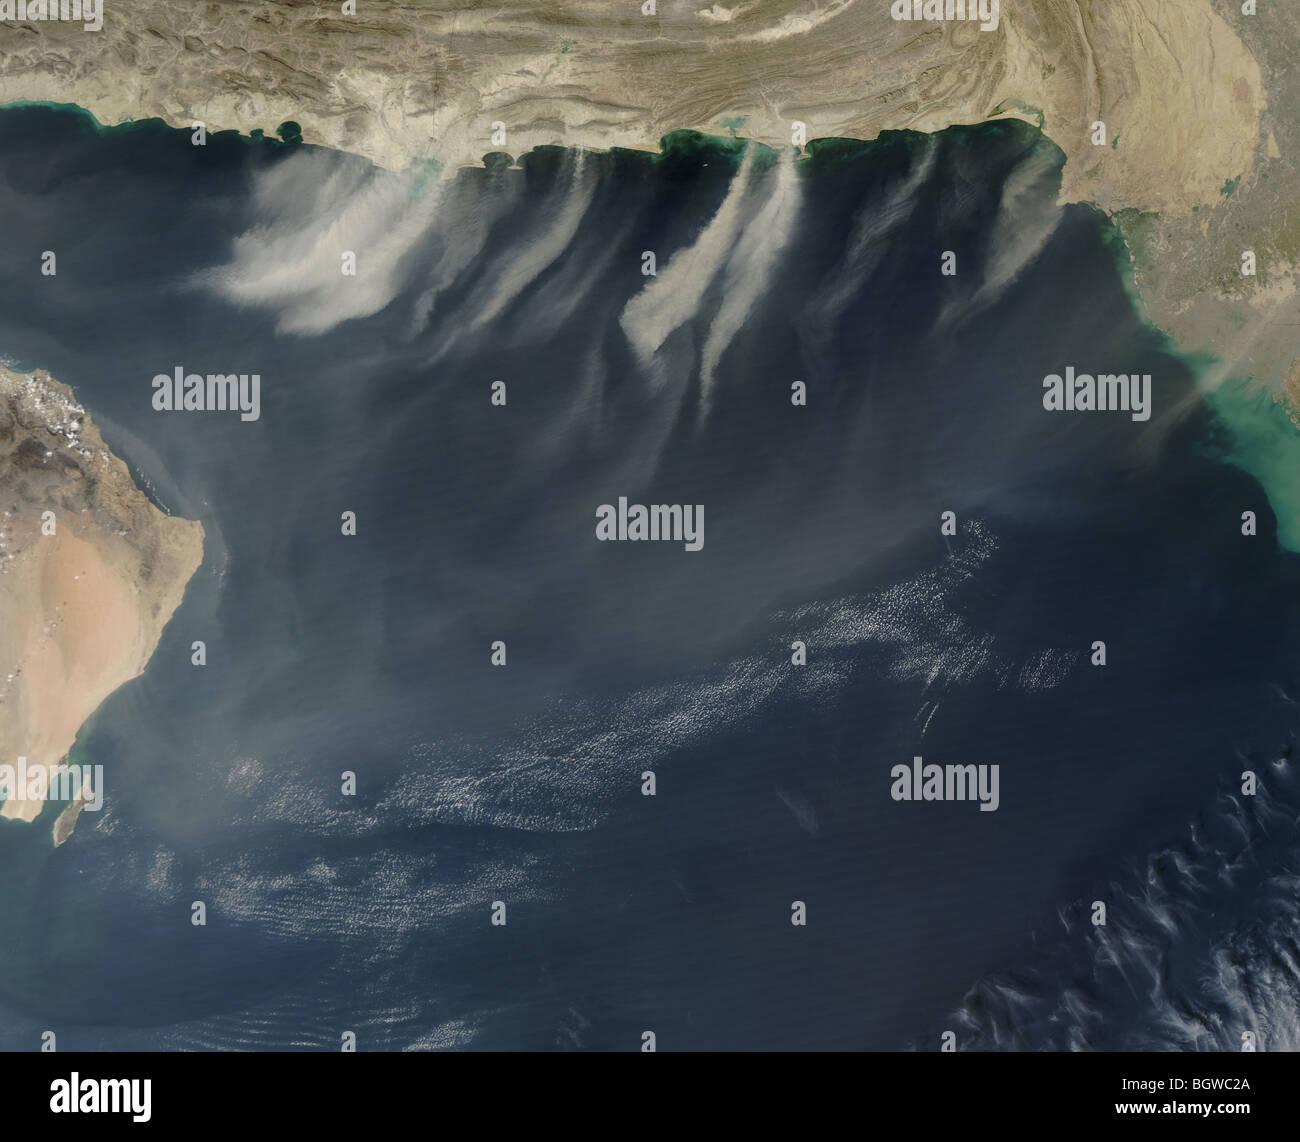 Satellite view captures dust across the Arabian Sea Satellite: Aqua, 2009 courtesy NASA - Stock Image